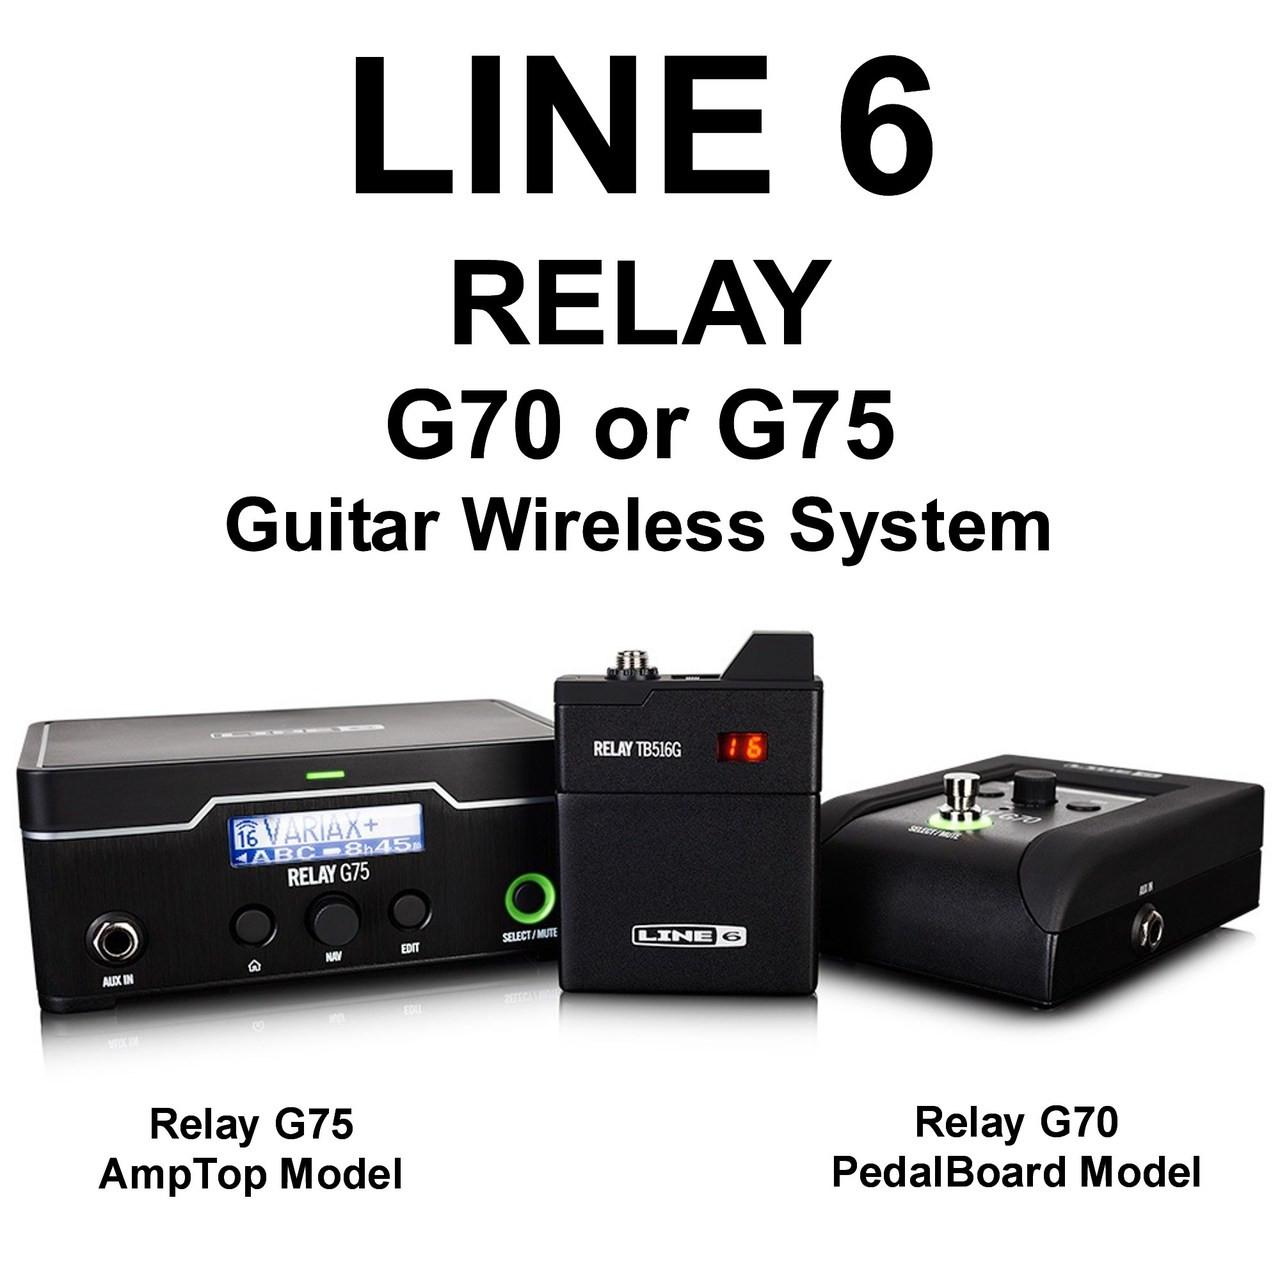 line 6 relay g70 pedalboard model or g75 amptop model guitar wireless system 50 instant coupon. Black Bedroom Furniture Sets. Home Design Ideas